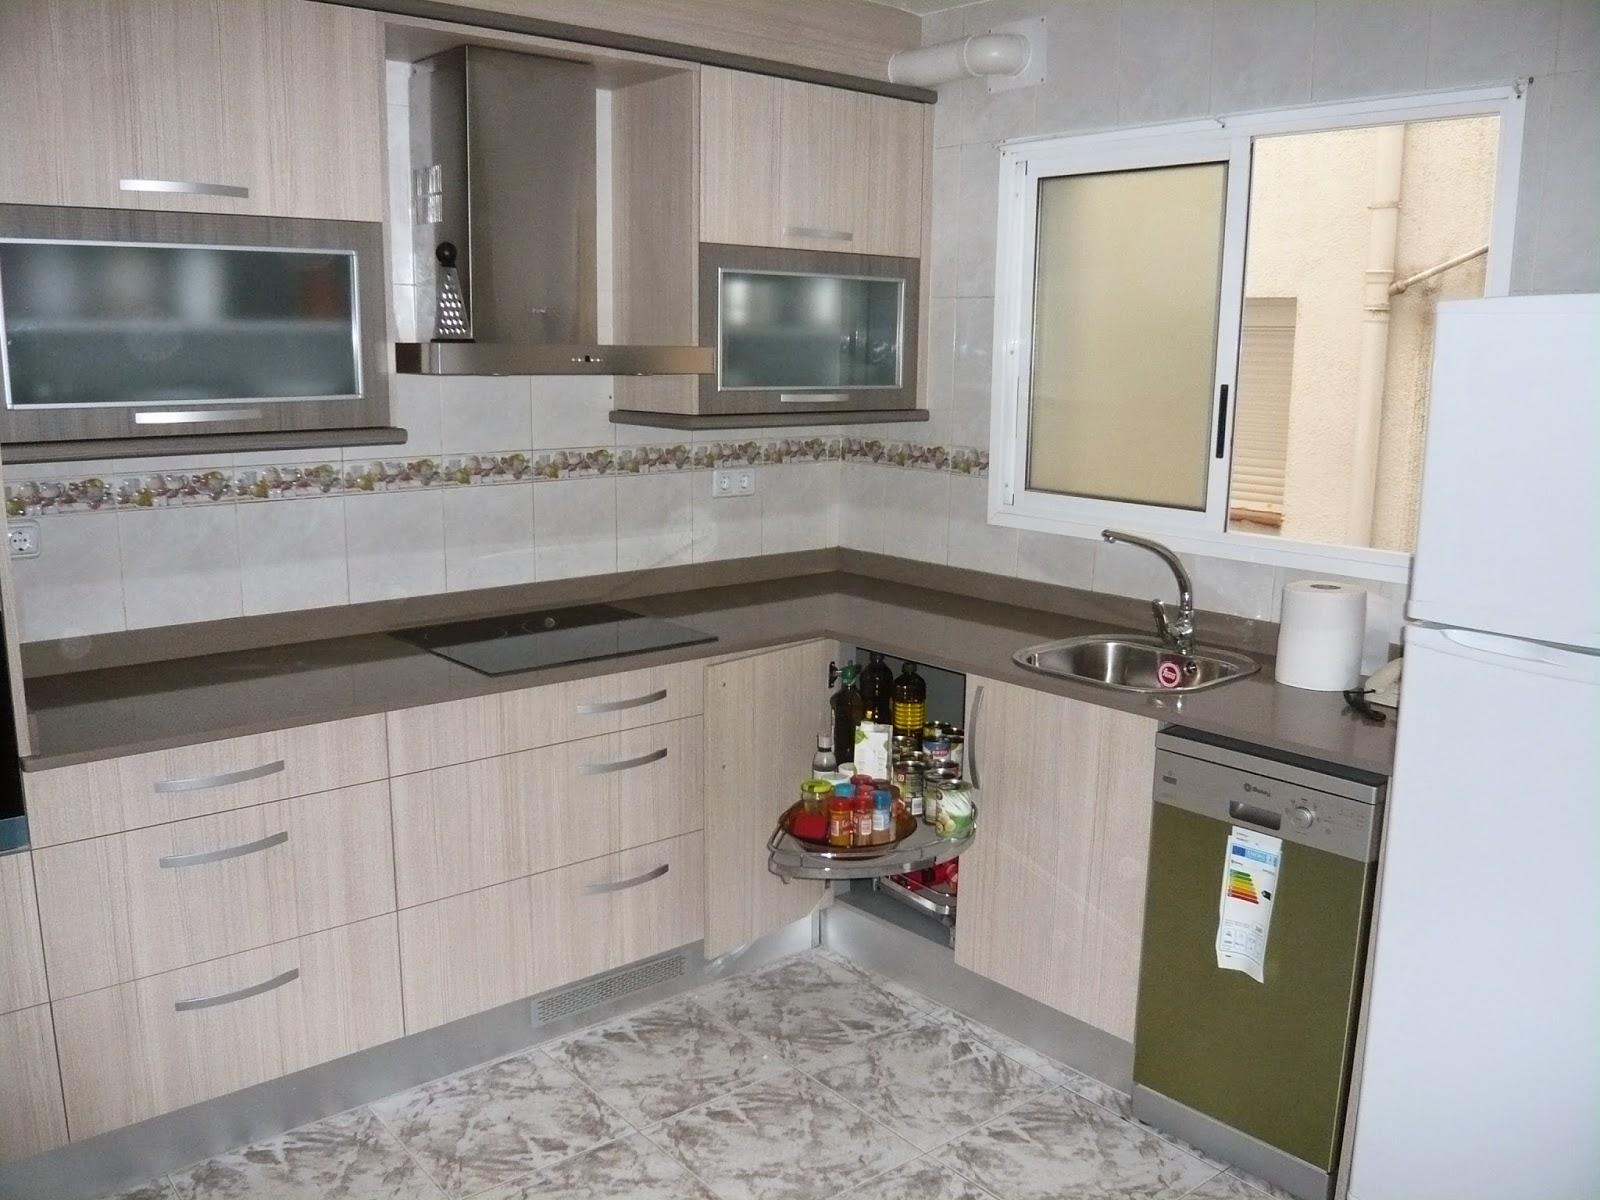 Reuscuina muebles de cocina de formica beige - Muebles de cocina de formica ...